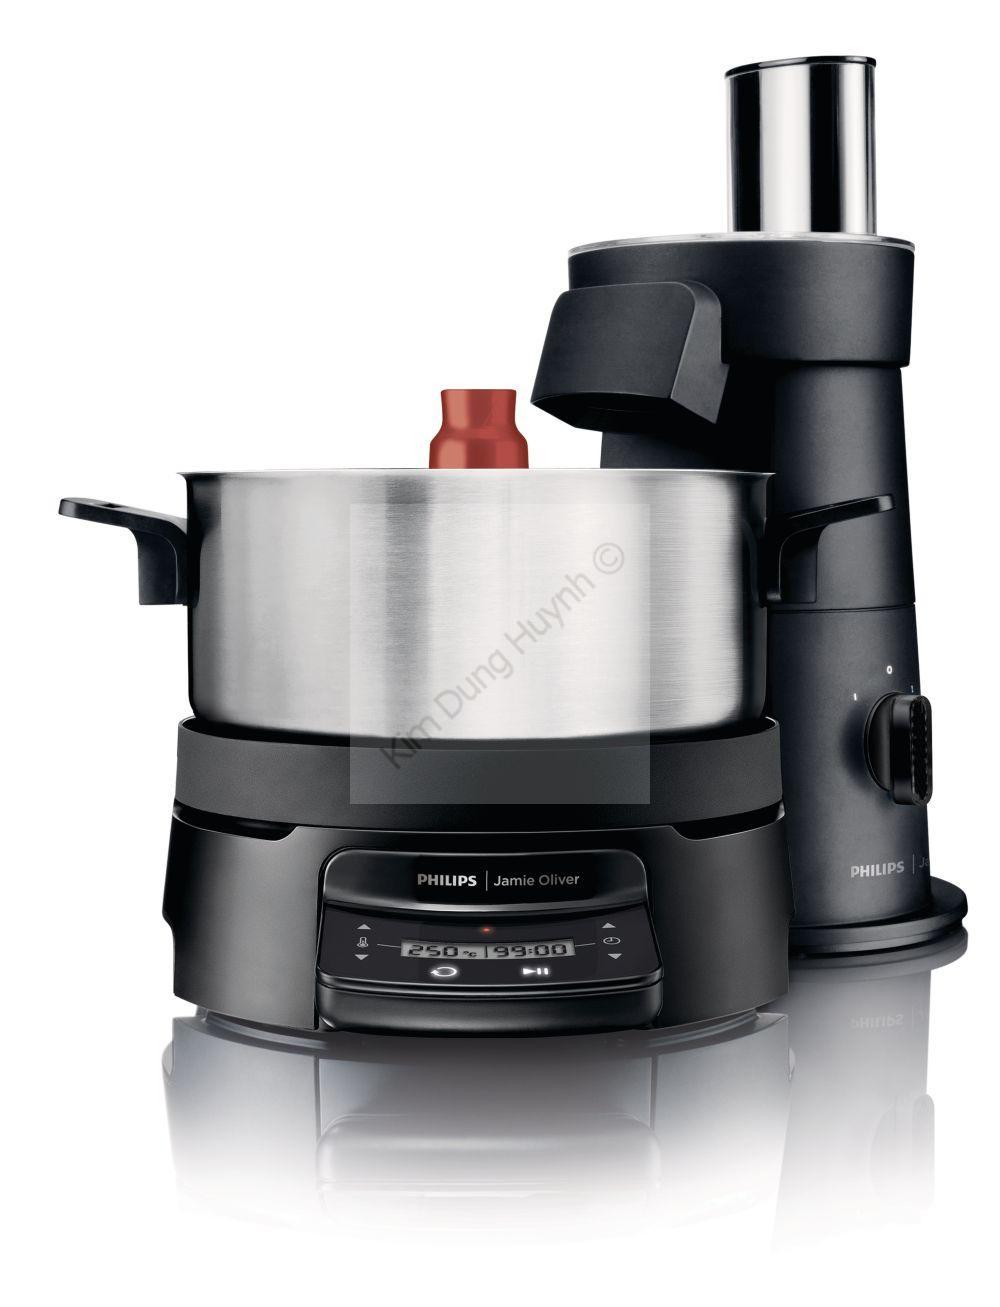 philips jamie oliver homecooker hr1050 90 dampfgarer schneideturm k chenmaschine ebay. Black Bedroom Furniture Sets. Home Design Ideas